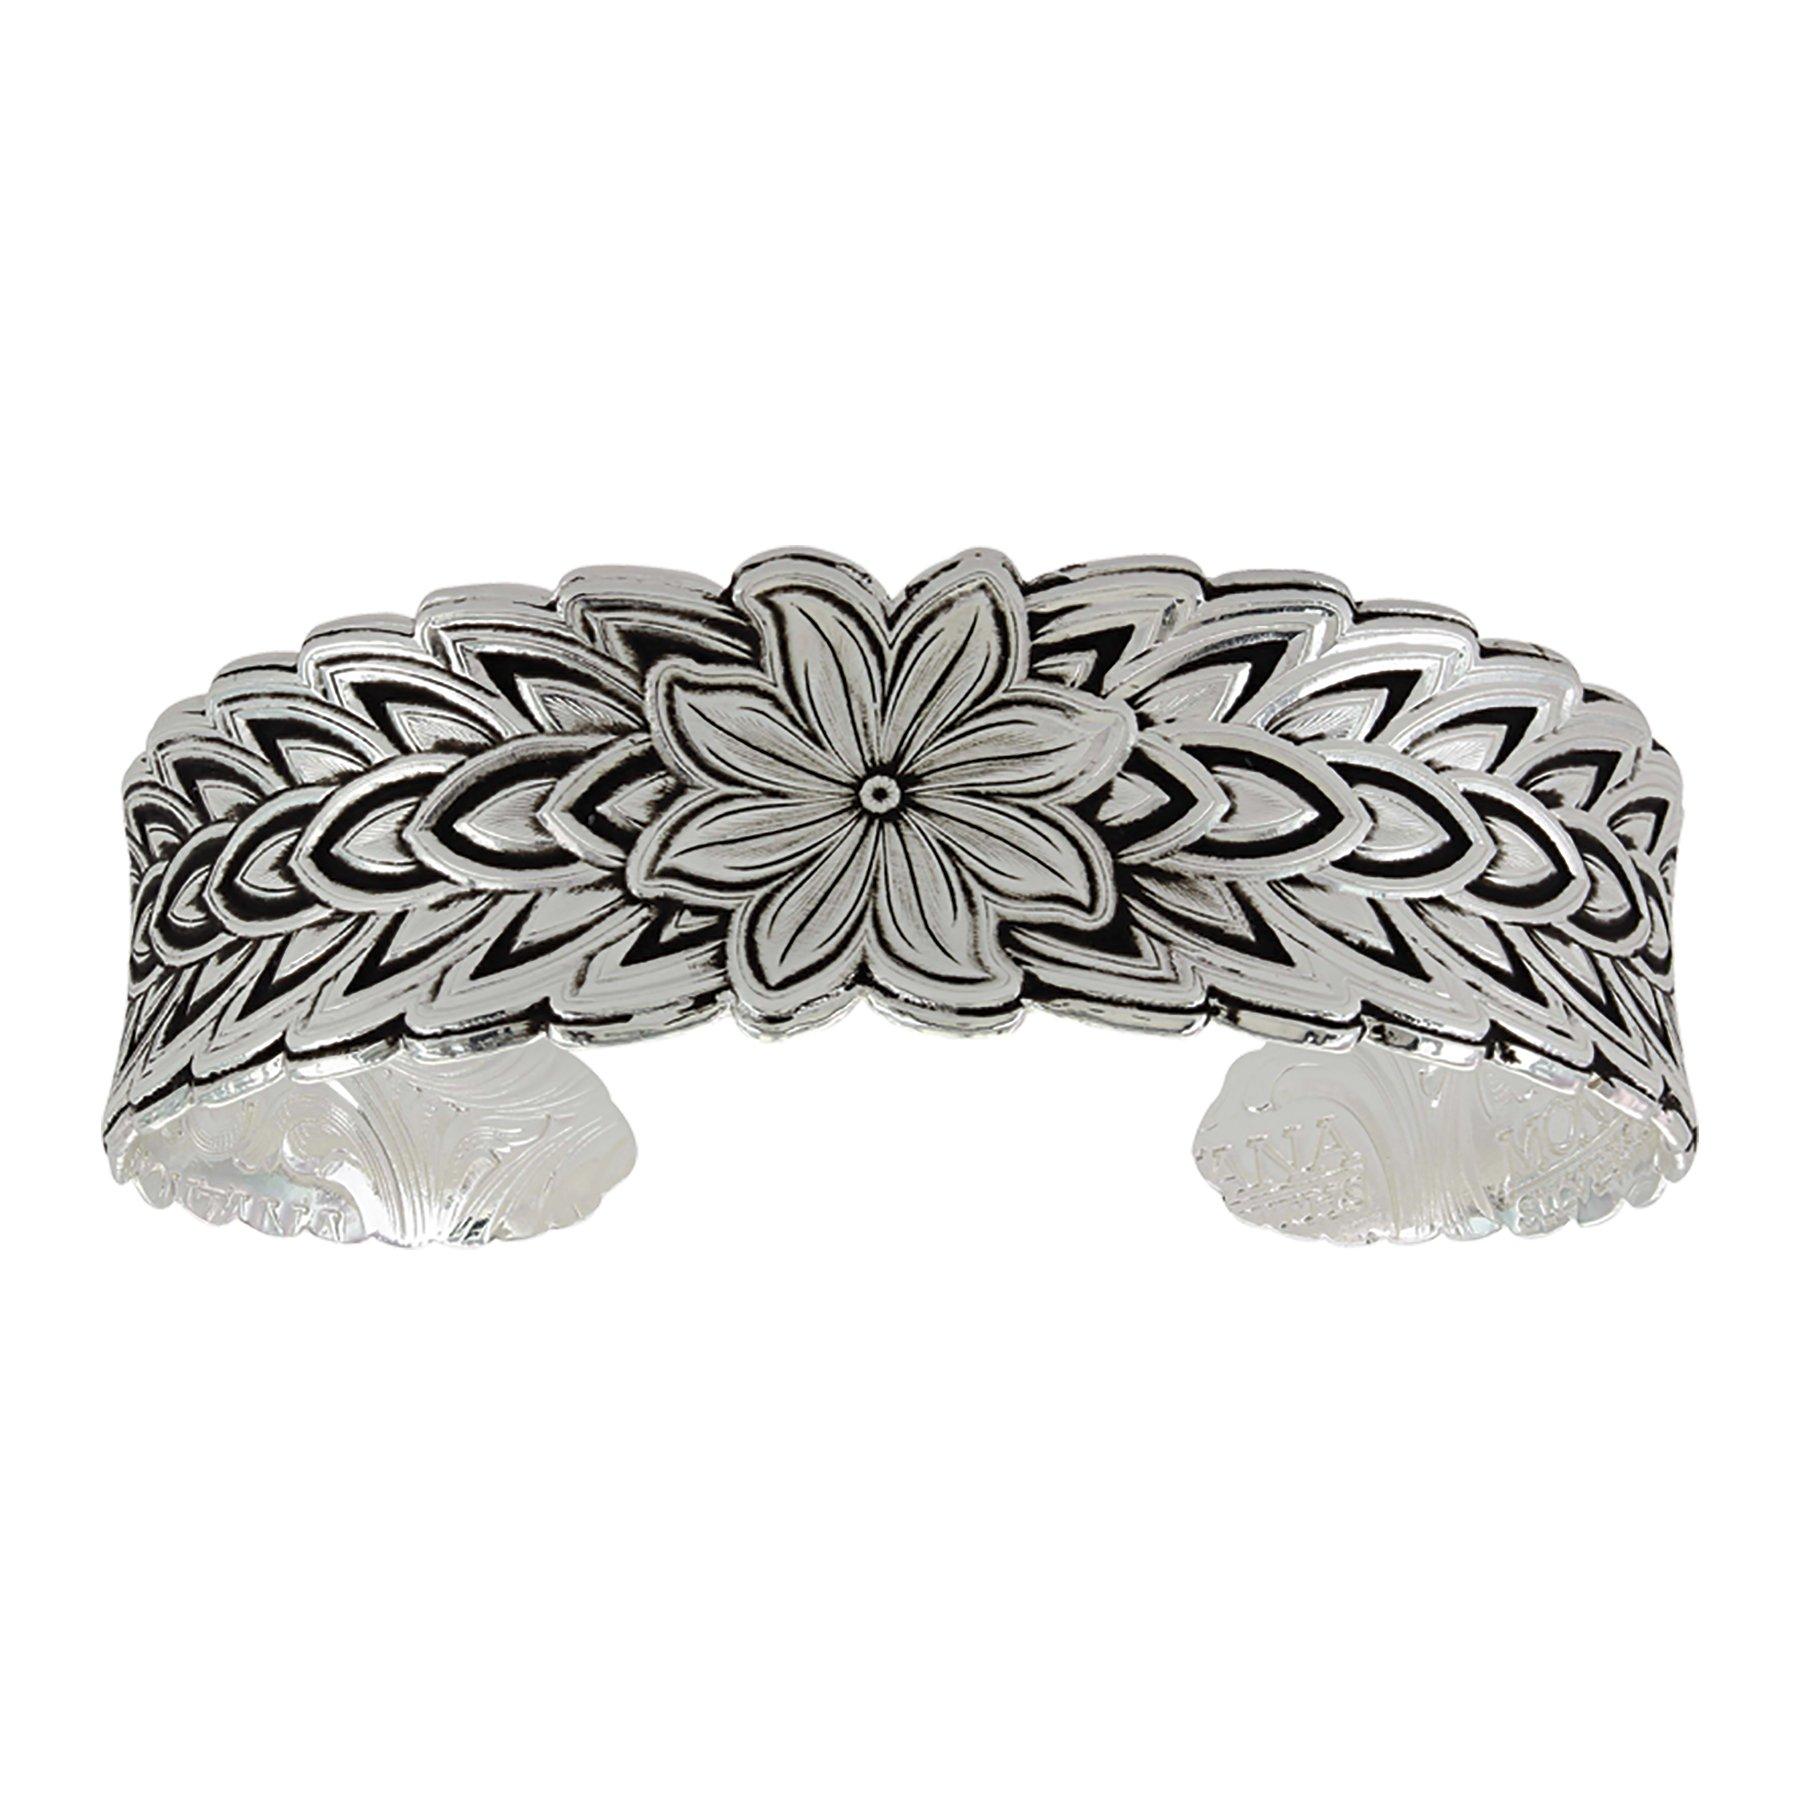 Montana Silversmiths Mosaic Flower Cuff Bracelet by Montana Silversmiths (Image #1)